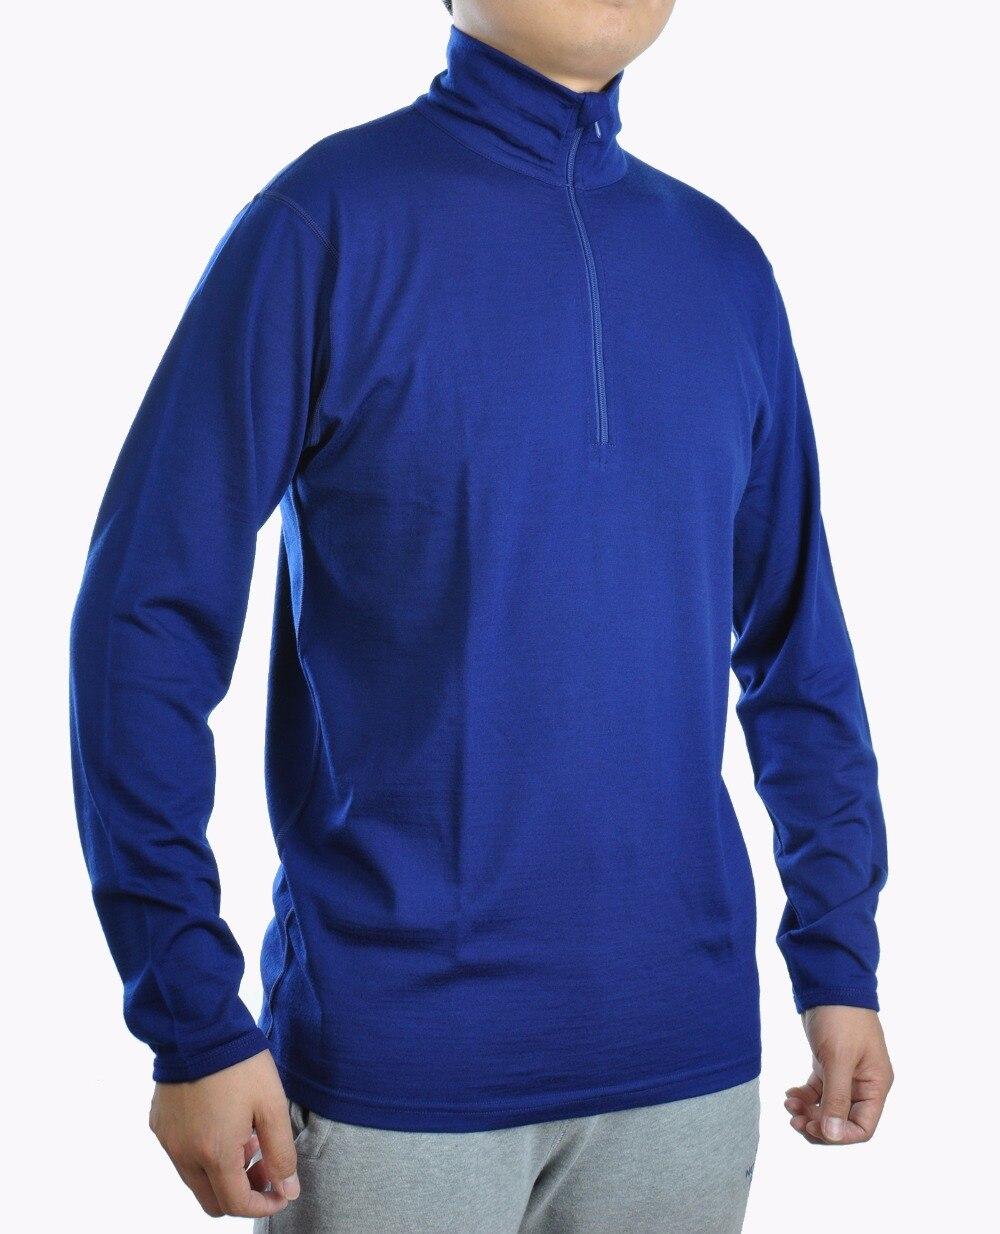 100% de lana larga Merino para hombre, camiseta de capa Base, Jersey de punto ligero 1/4 YKK Zip Flat Lock costuras